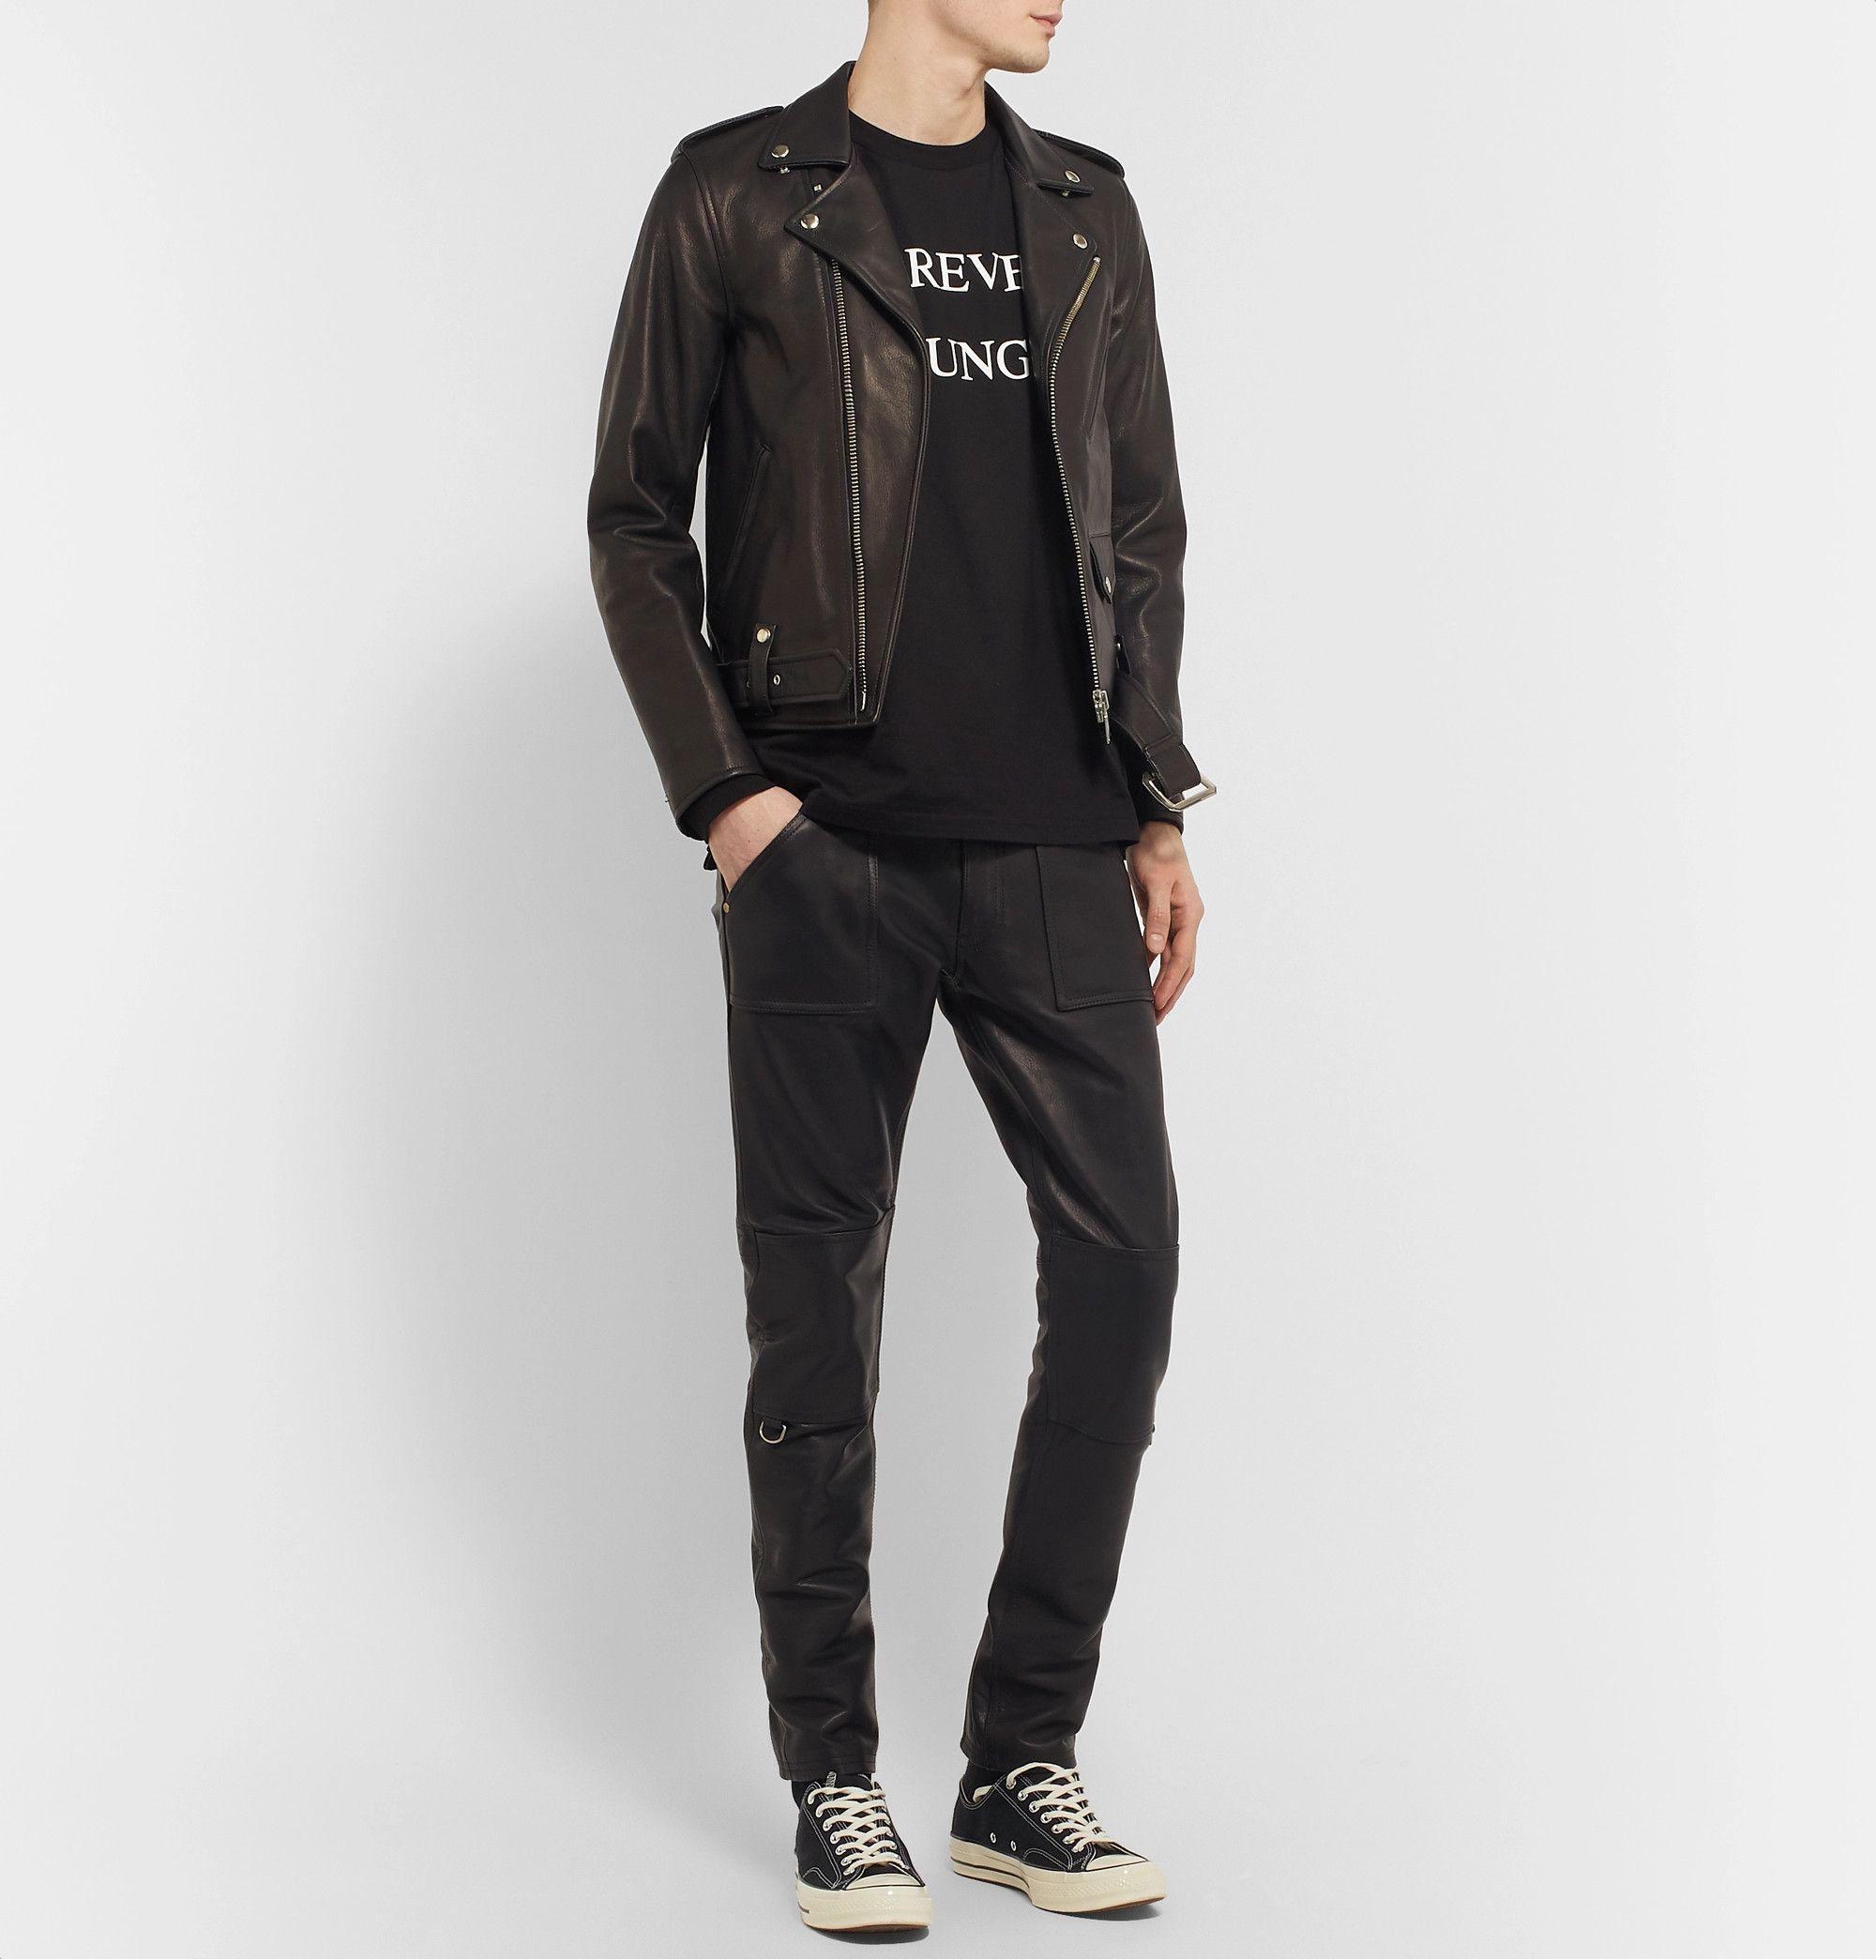 Blackmeans Black Slim Fit Leather Biker Jacket Jackets Leather Biker Jacket Leather Jacket [ 2089 x 2000 Pixel ]